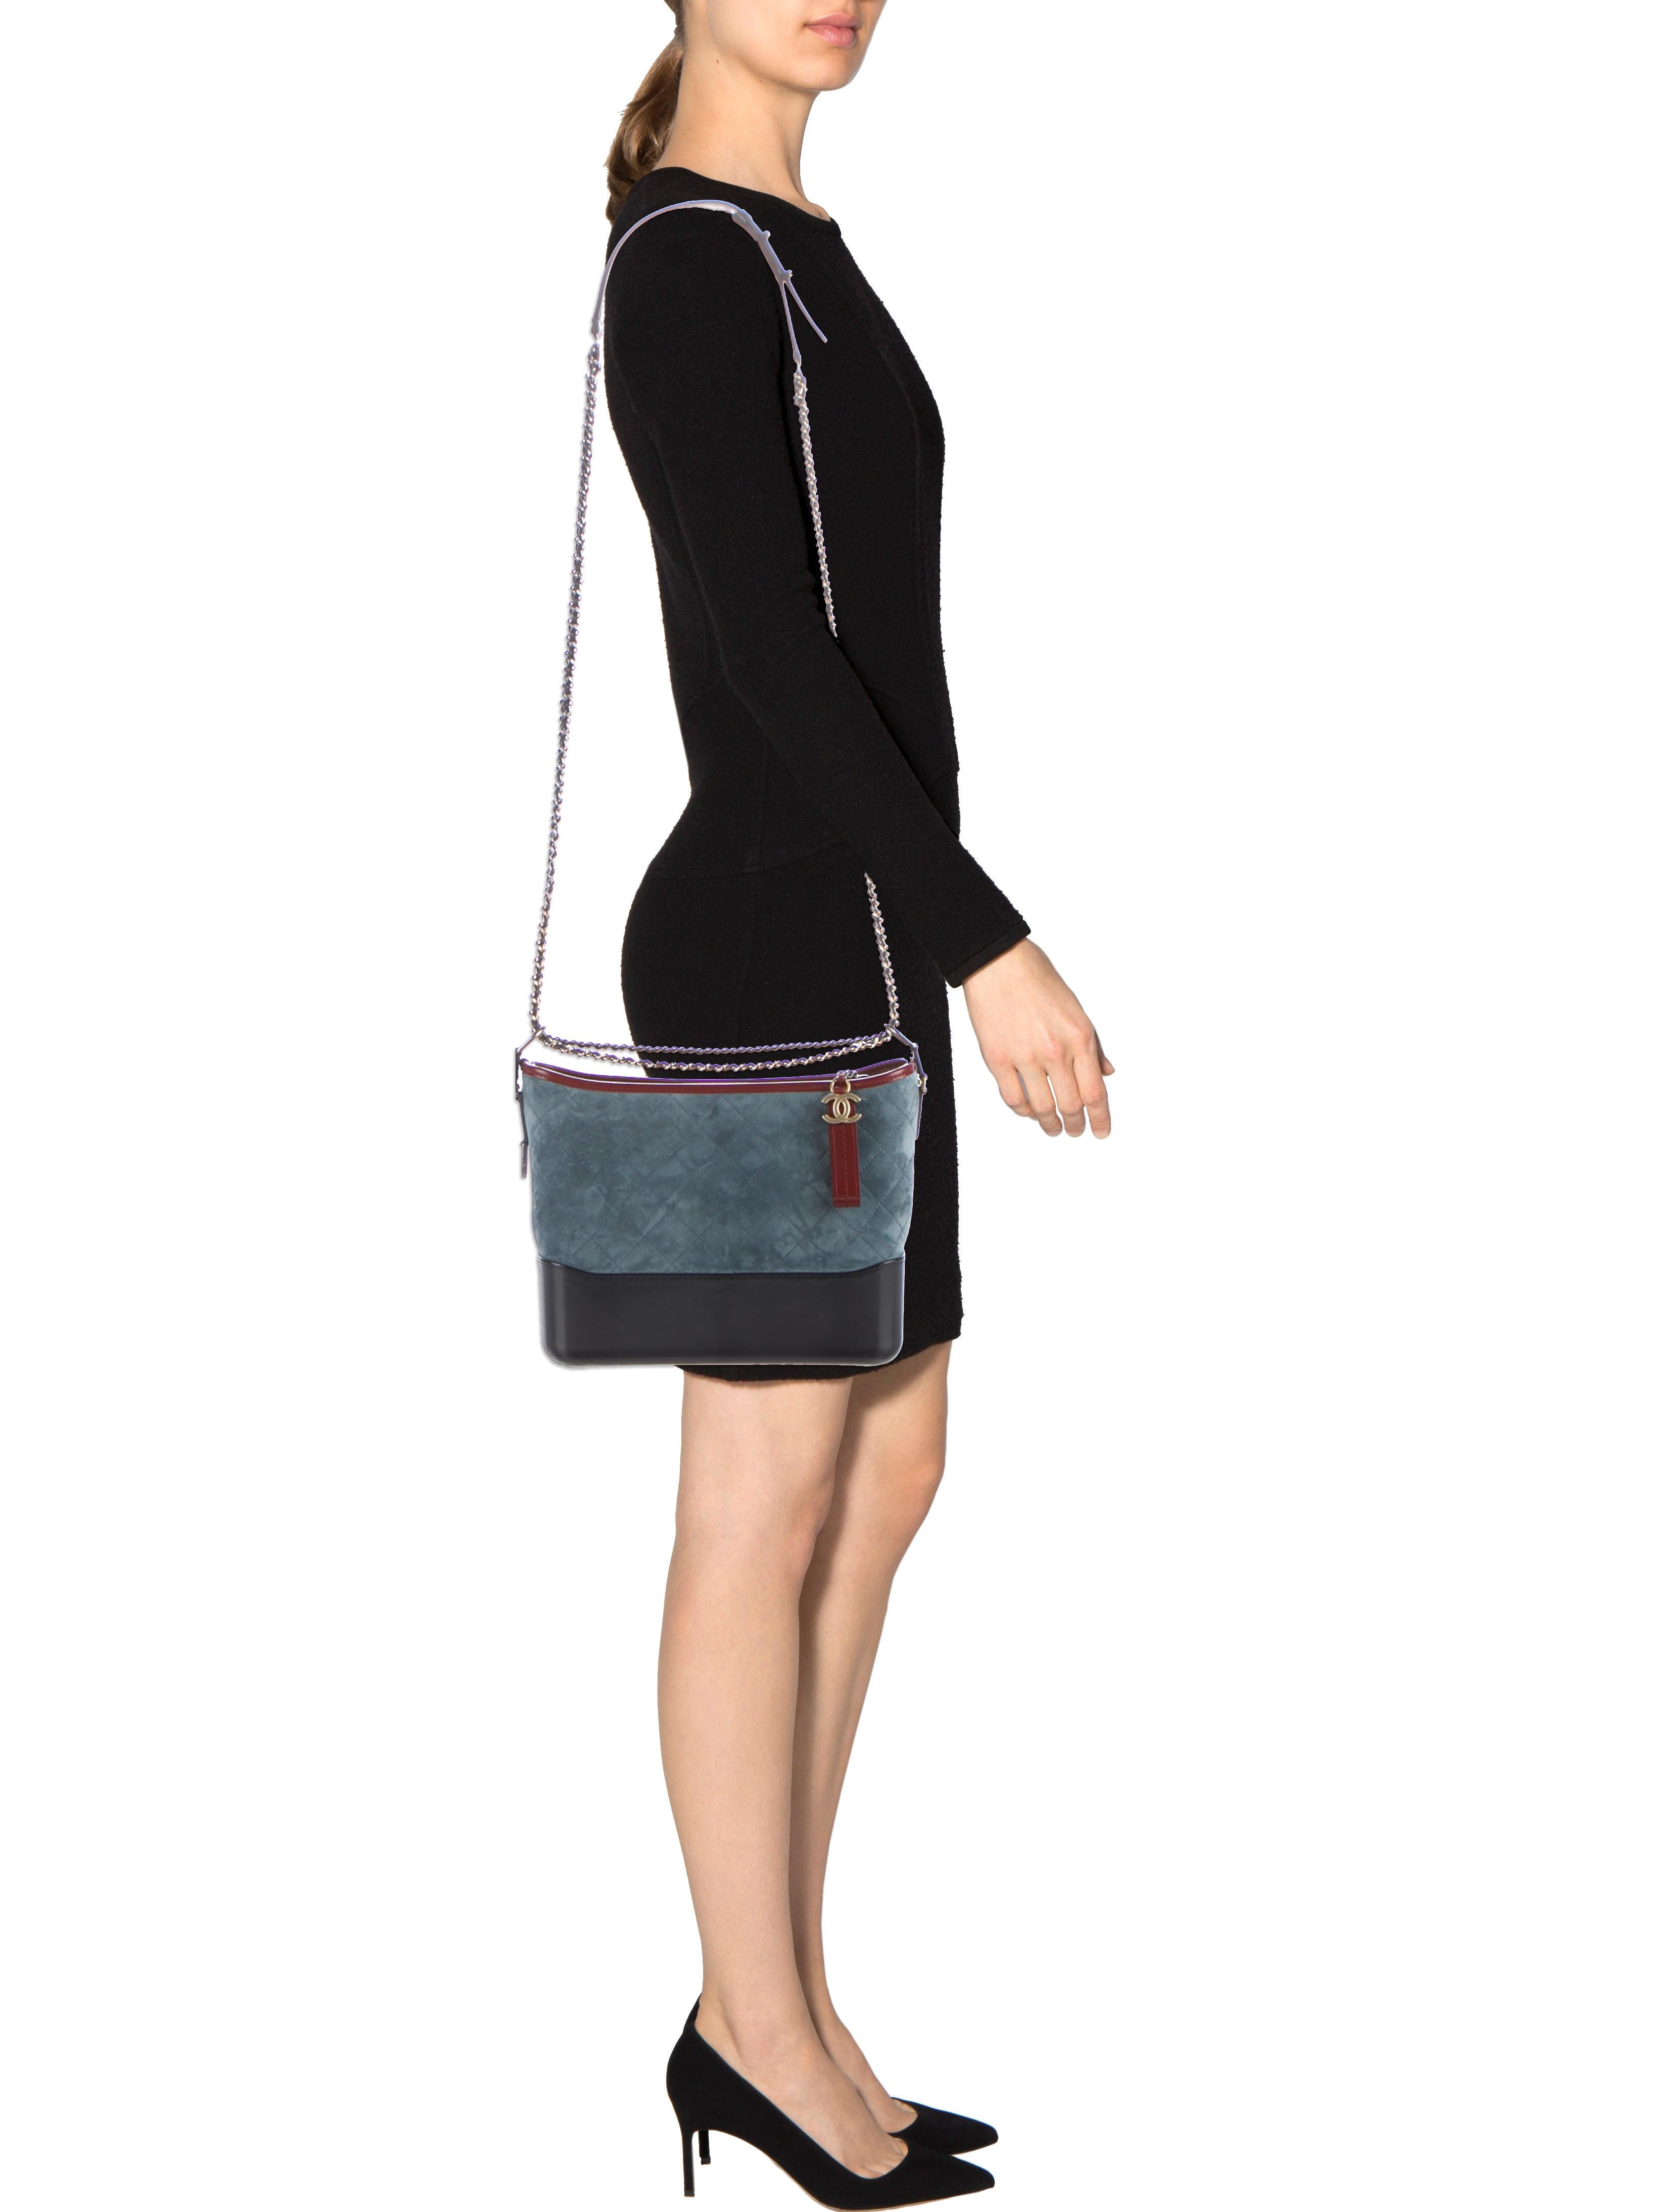 Chanel 2017 Medium Gabrielle Hobo Handbags Cha188269